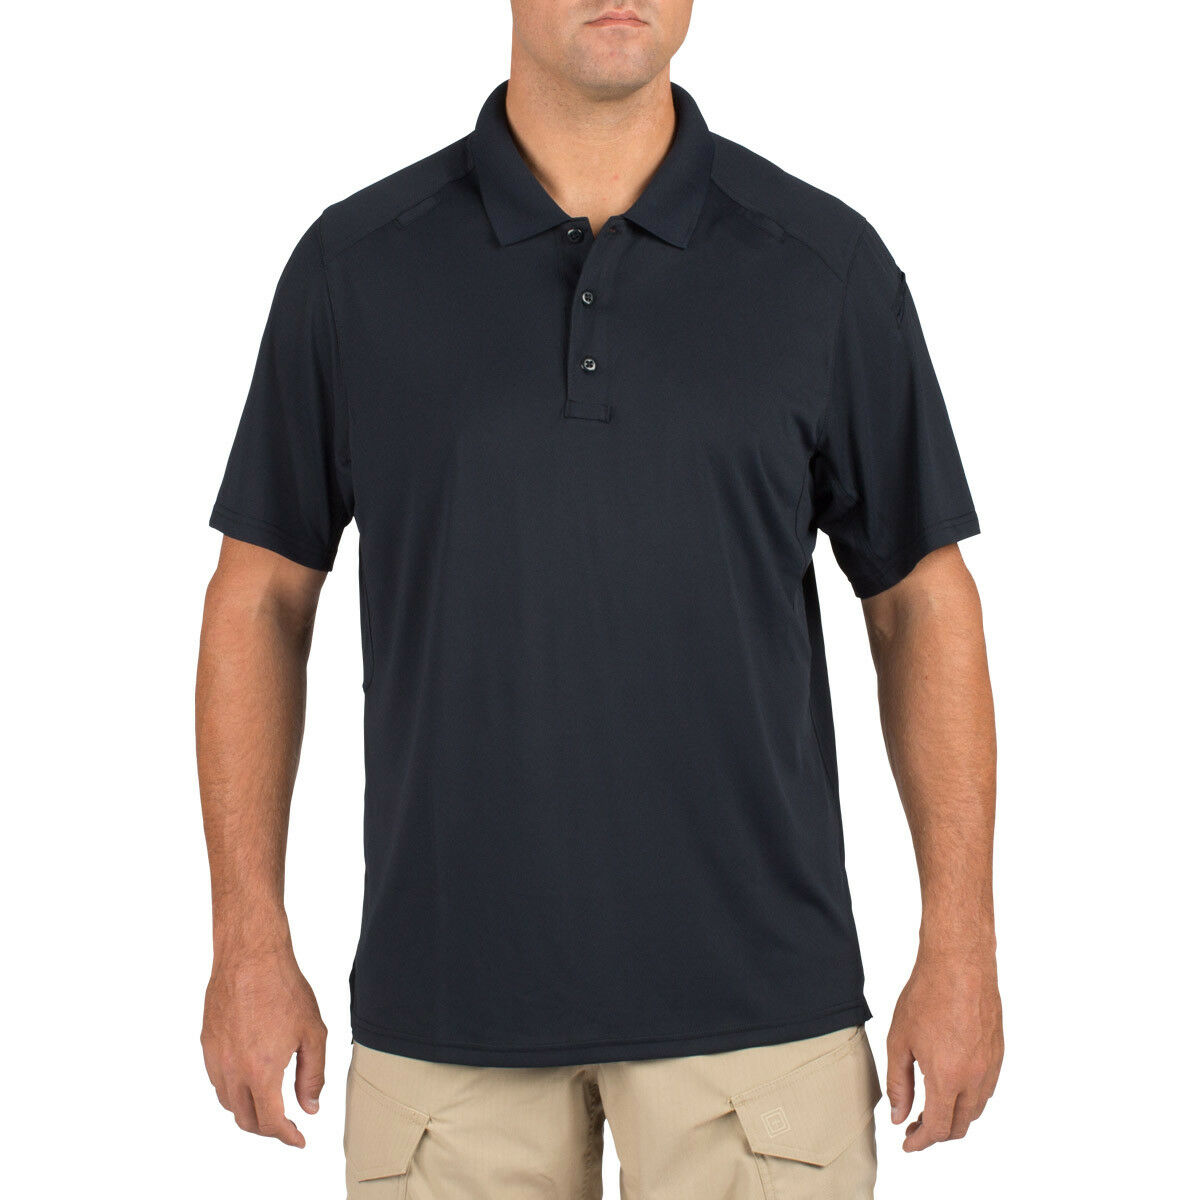 5.11 Helios Mens Polo Tactical Marine Cadet Shirt Hiking Short Sleeve Dark Navy